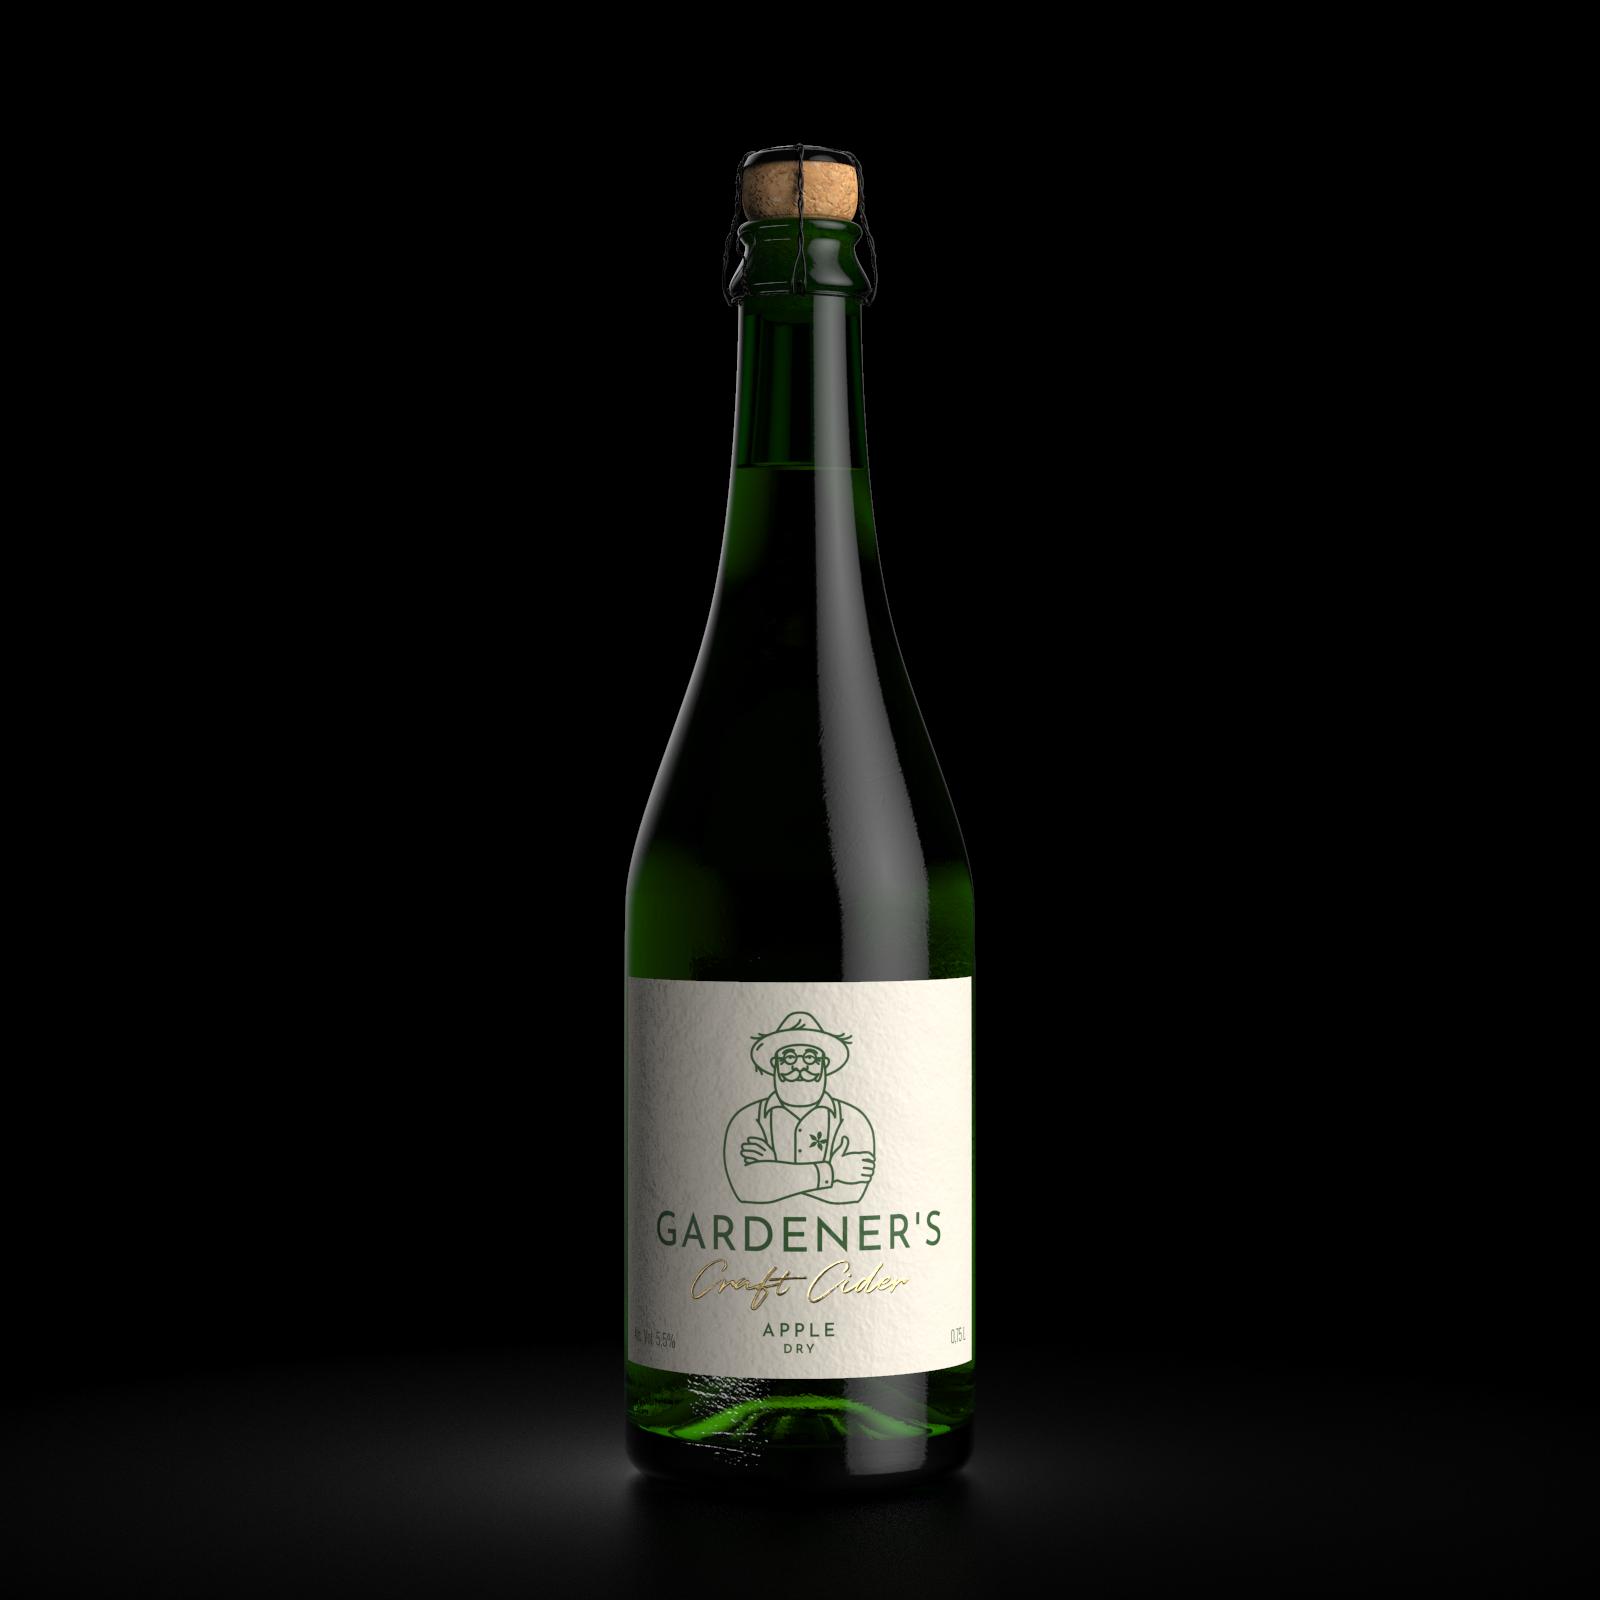 GARDENER'S Cider Label Design